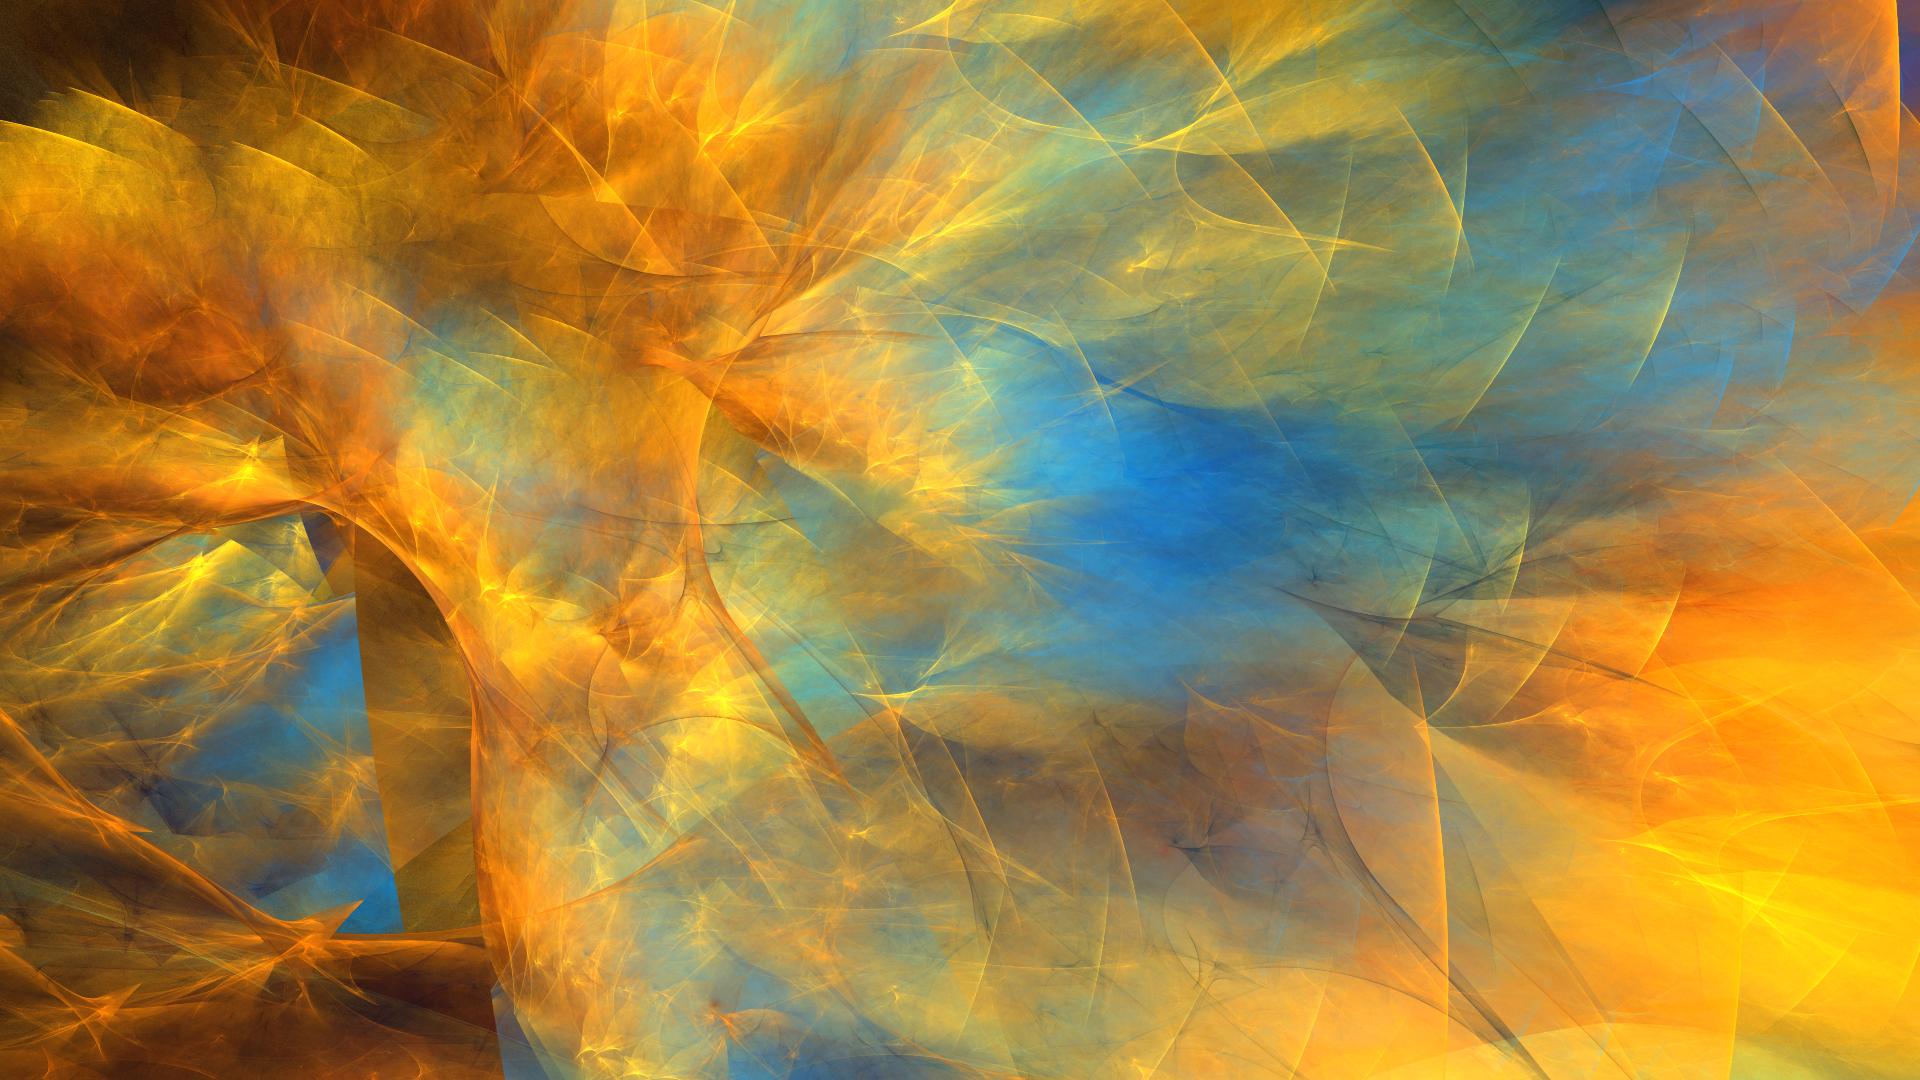 Abstract Apophysis Software Artistic Colors Digital Art Fractal Shapes 1920x1080